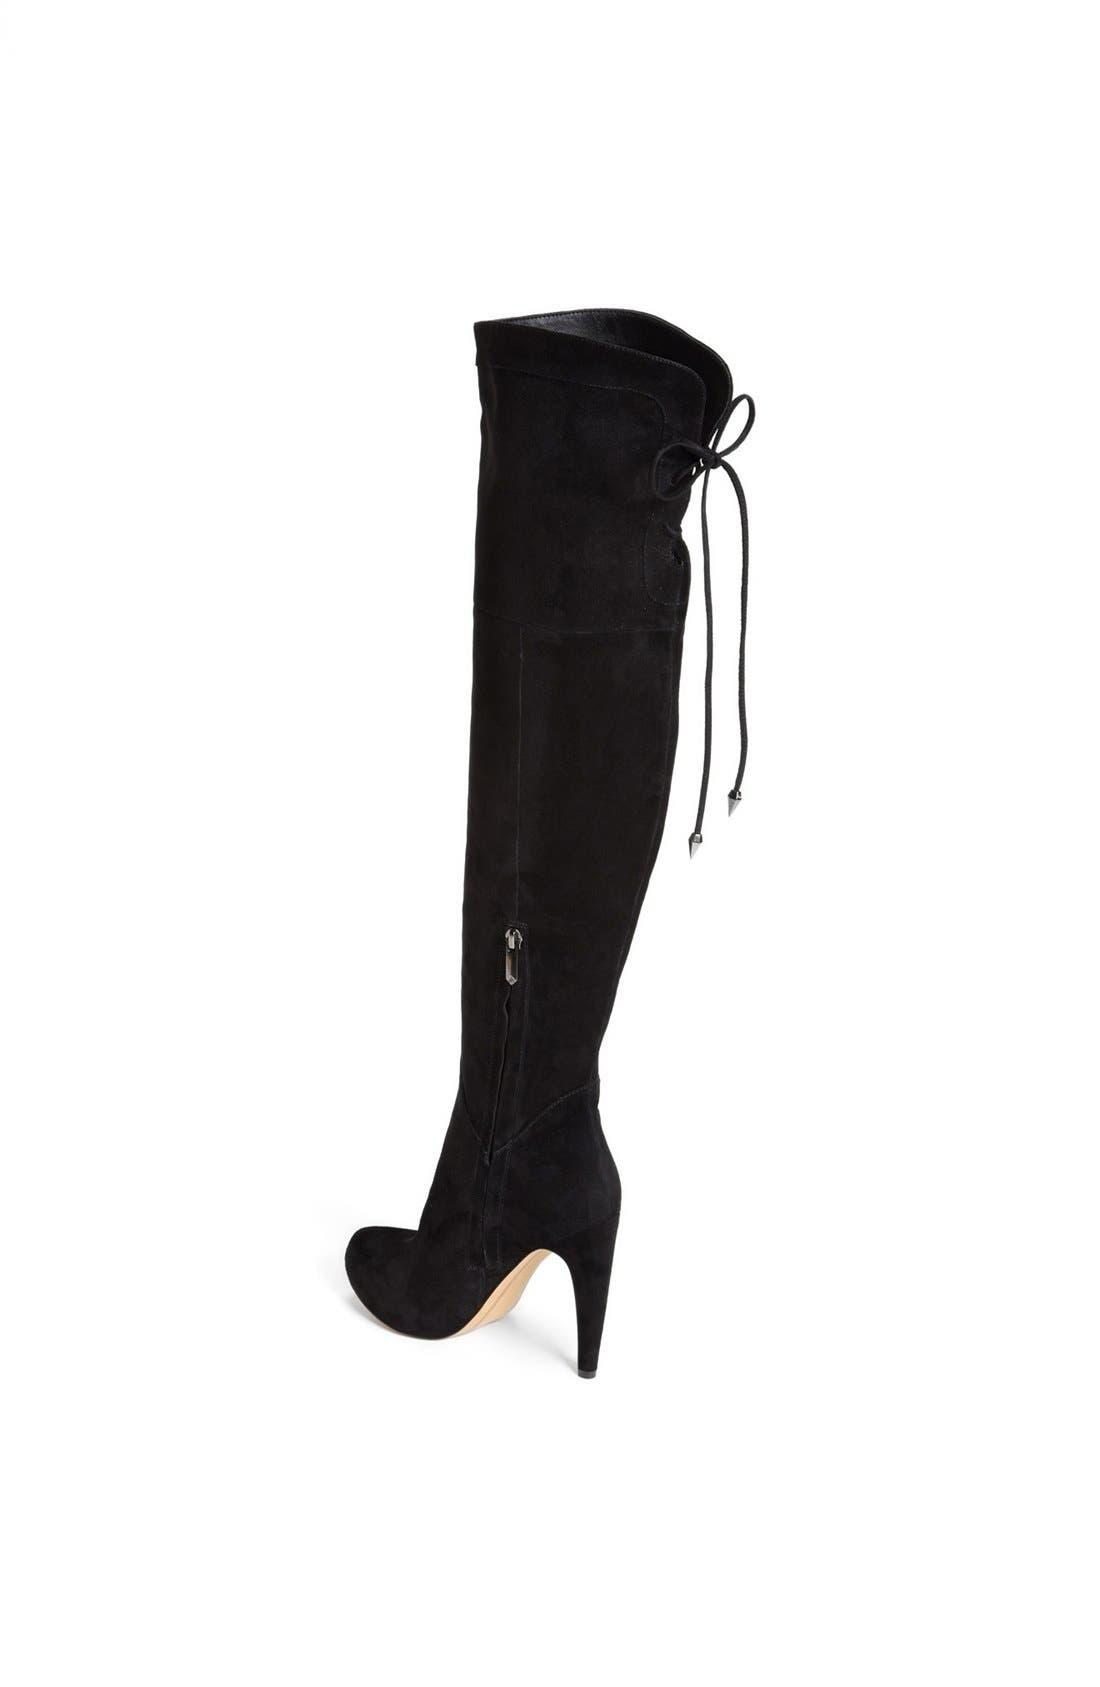 Alternate Image 3  - Sam Edelman 'Kayla' Over the Knee Boot (Women) (Online Only)